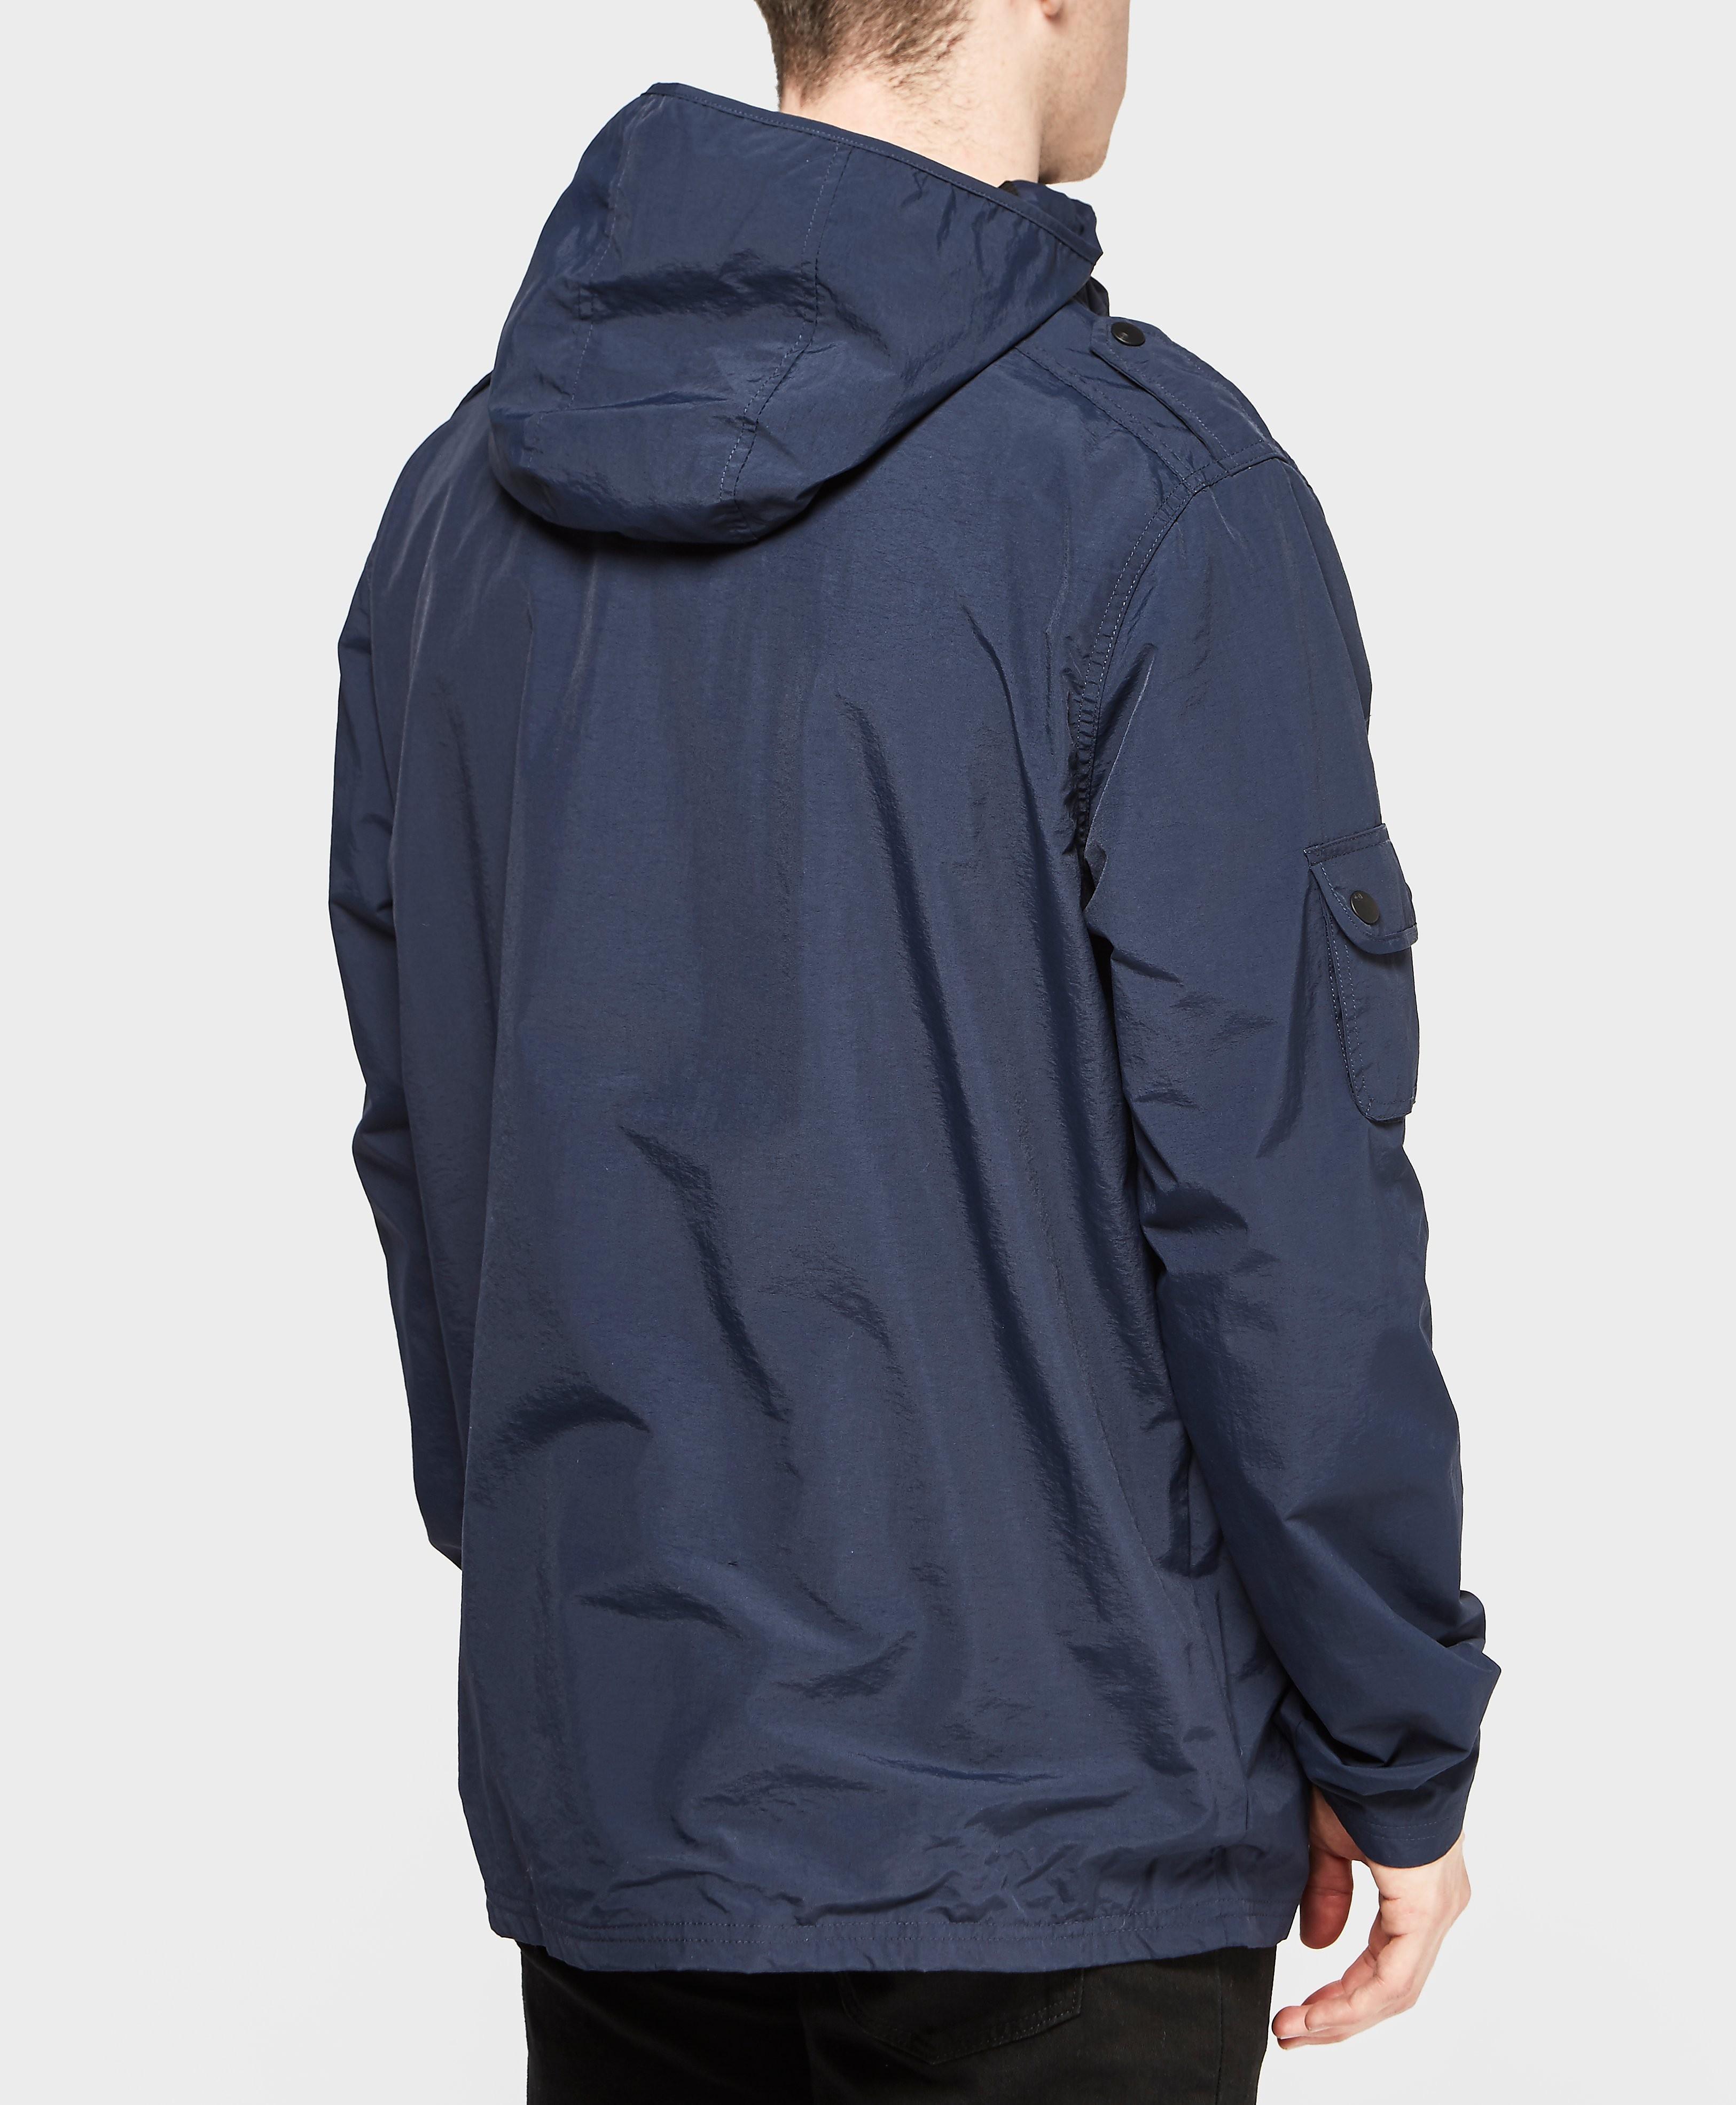 Nicholas Deakins Casual Lightweight Jacket - Exclusive